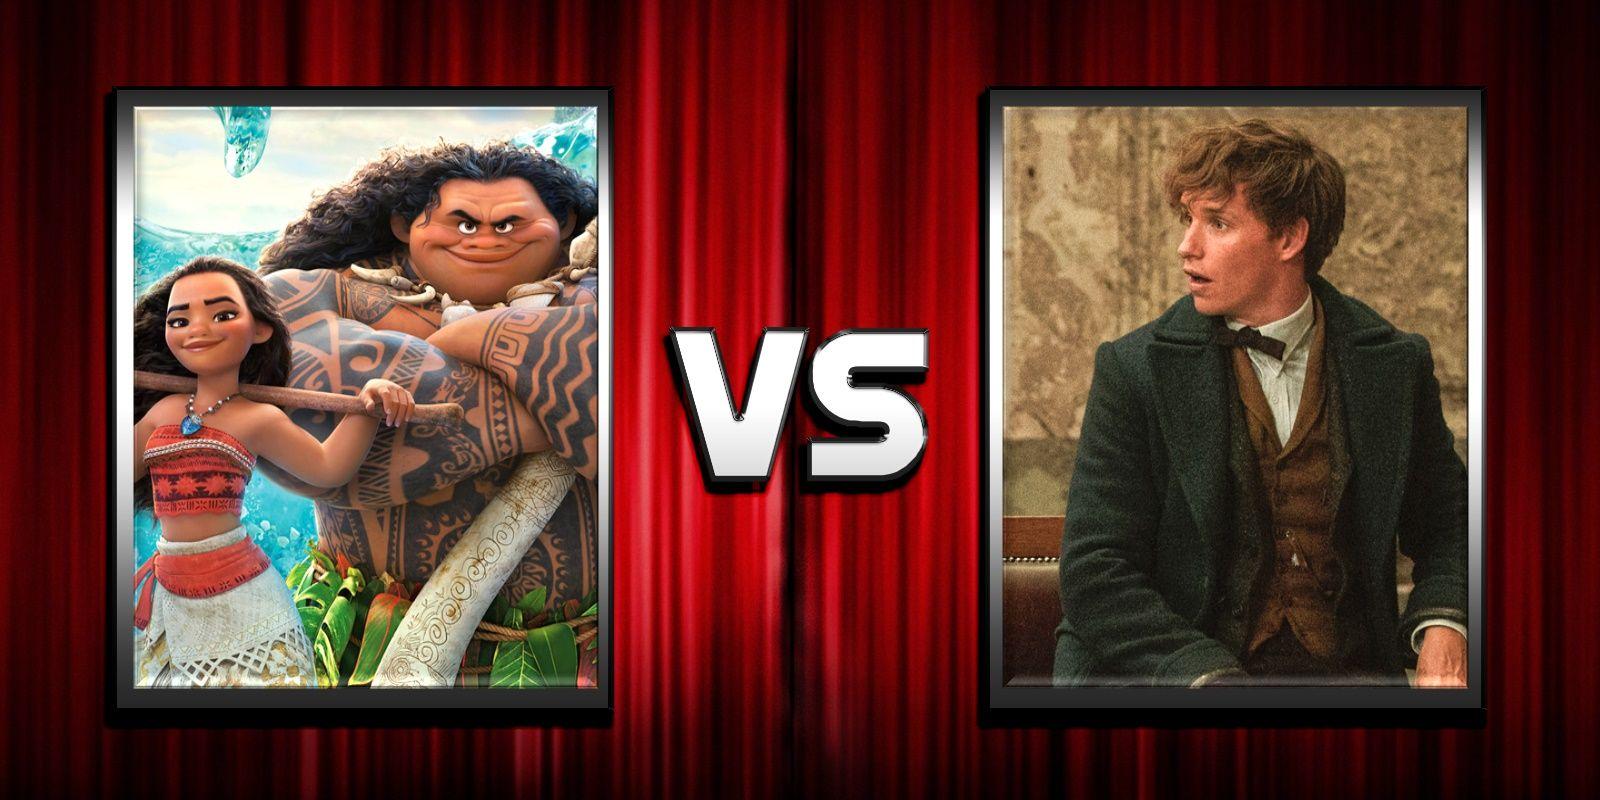 Box office prediction moana vs fantastic beasts screenrant - 2016 box office predictions ...